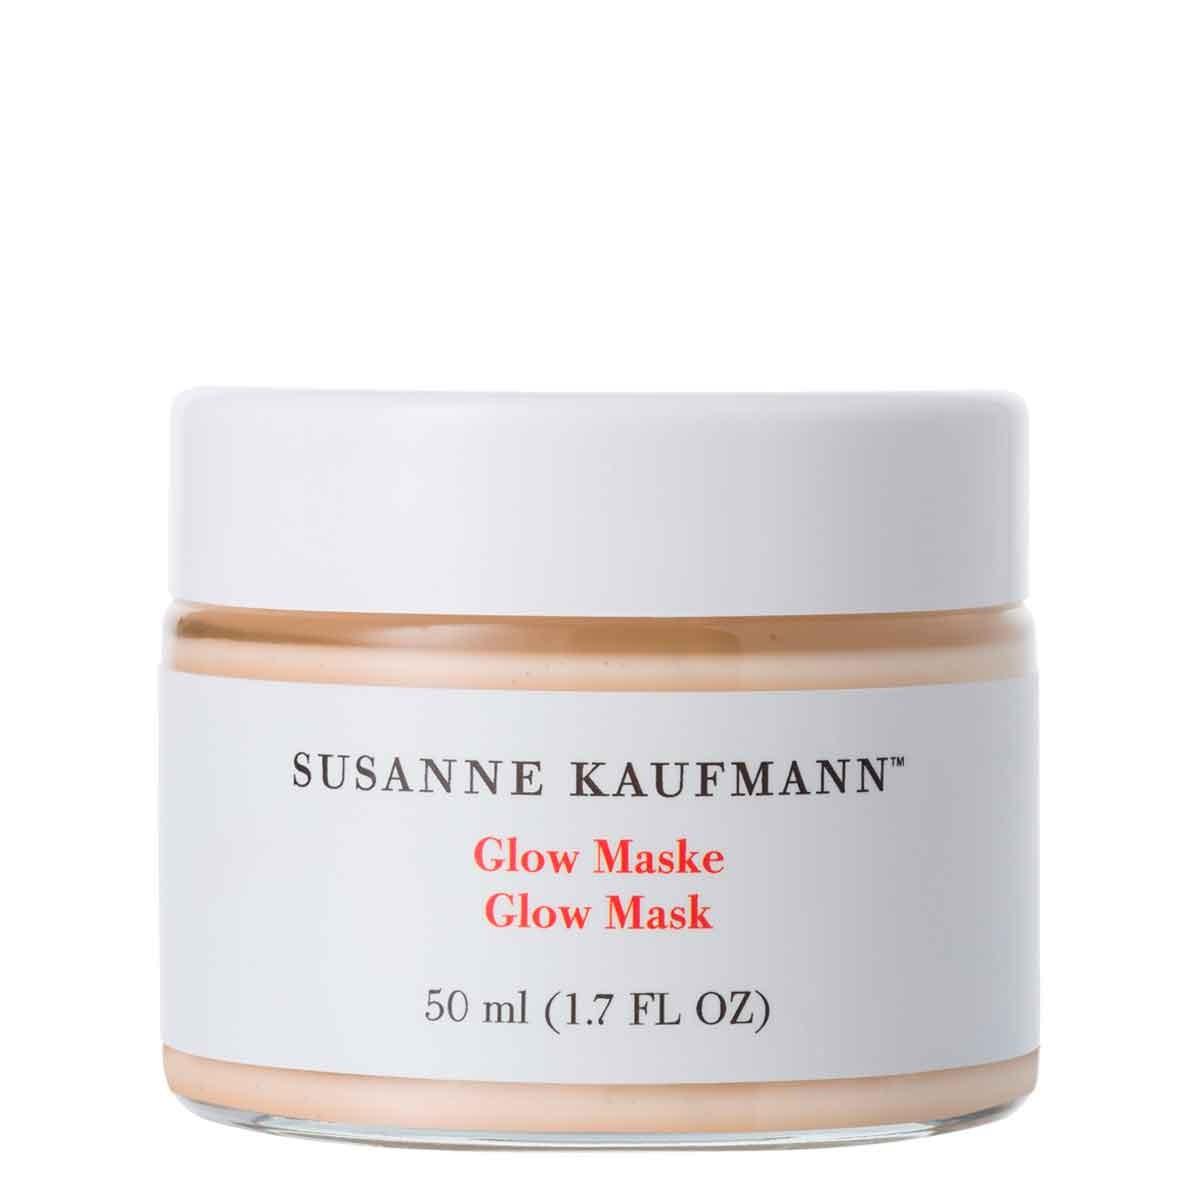 Susanne Kaufmann Glow Mask - mascarilla iluminadora natural